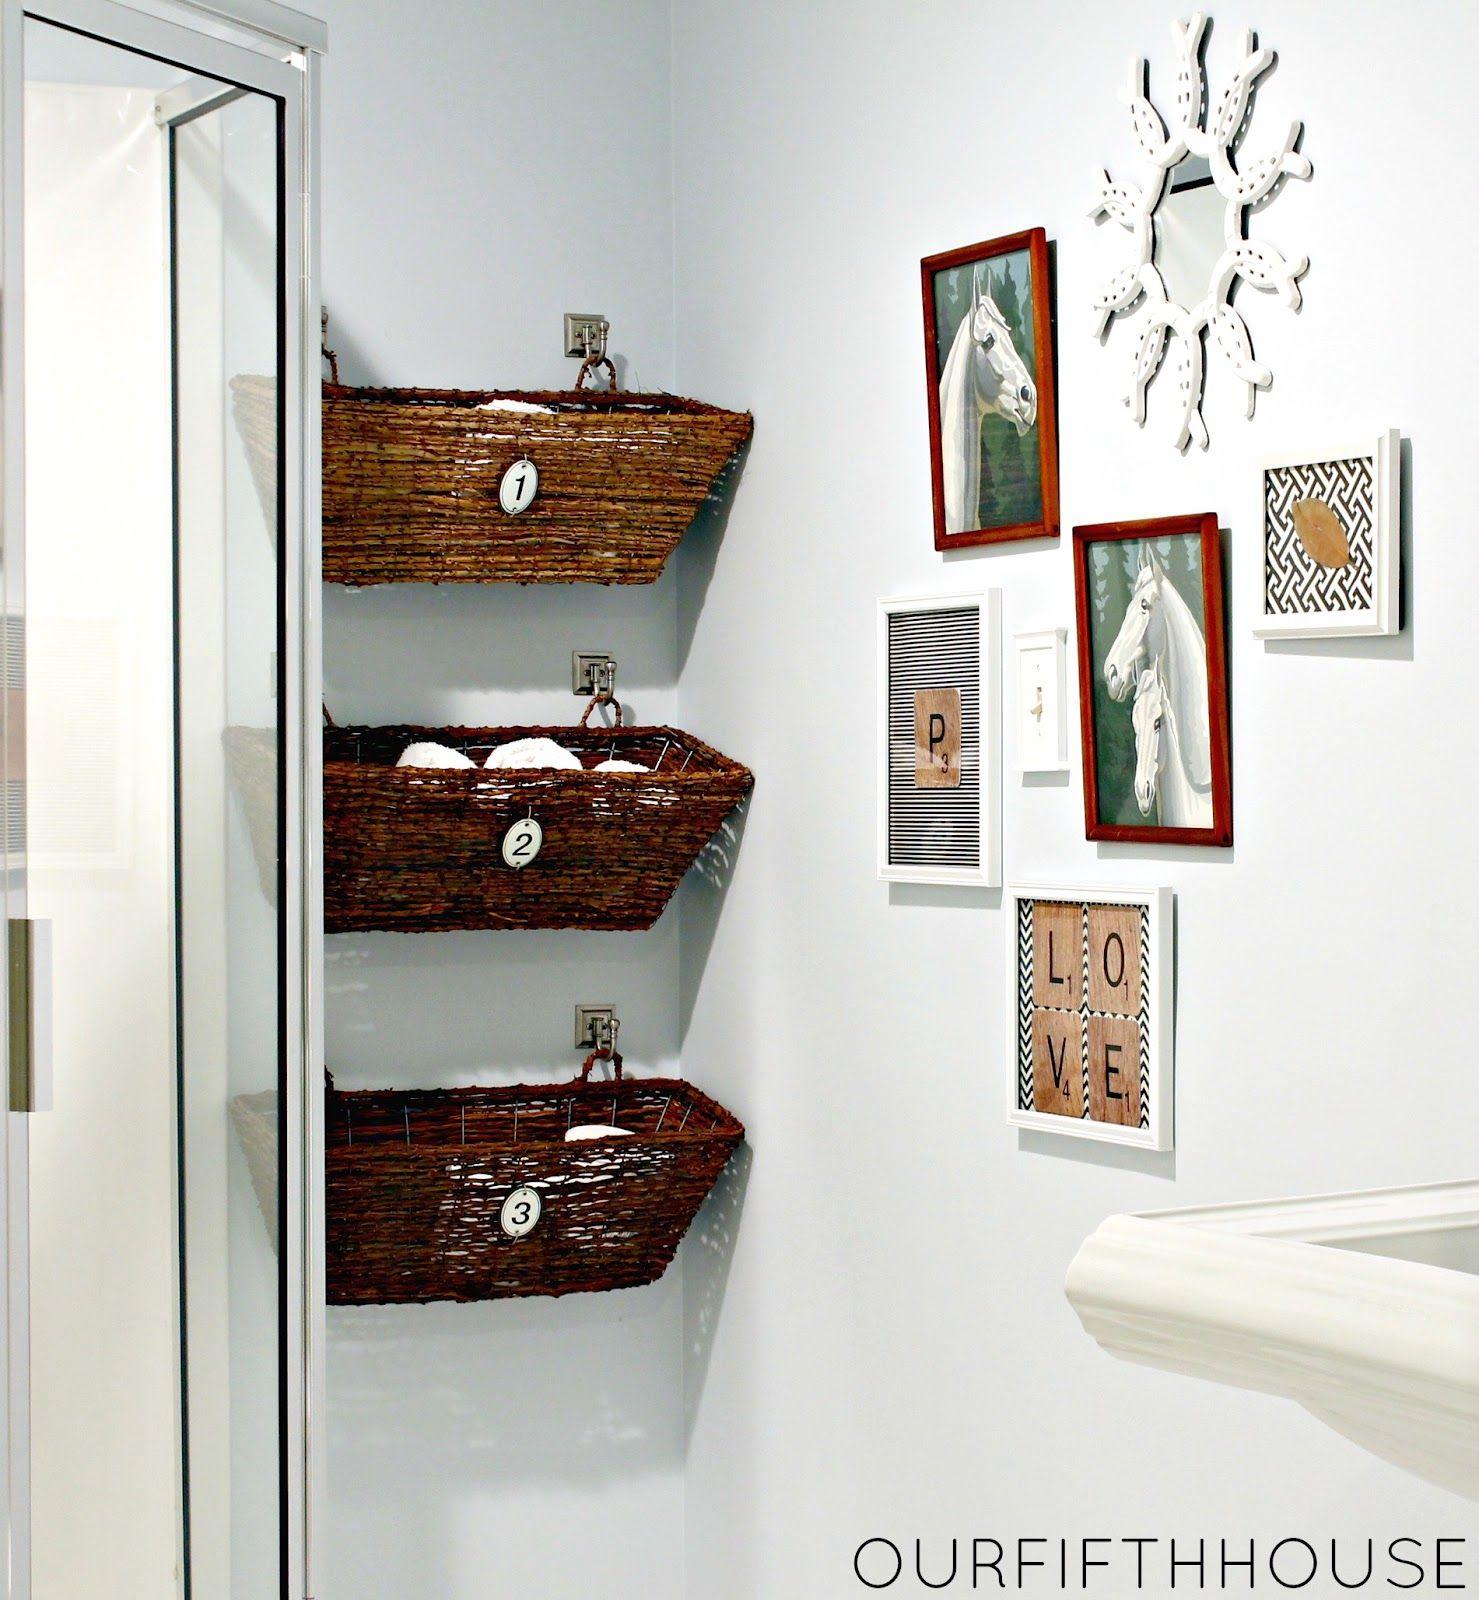 22 small bathroom storage ideas wall storage solutions and shelves rh goodhousekeeping com storage solutions for small bathrooms makeup storage for small bathroom